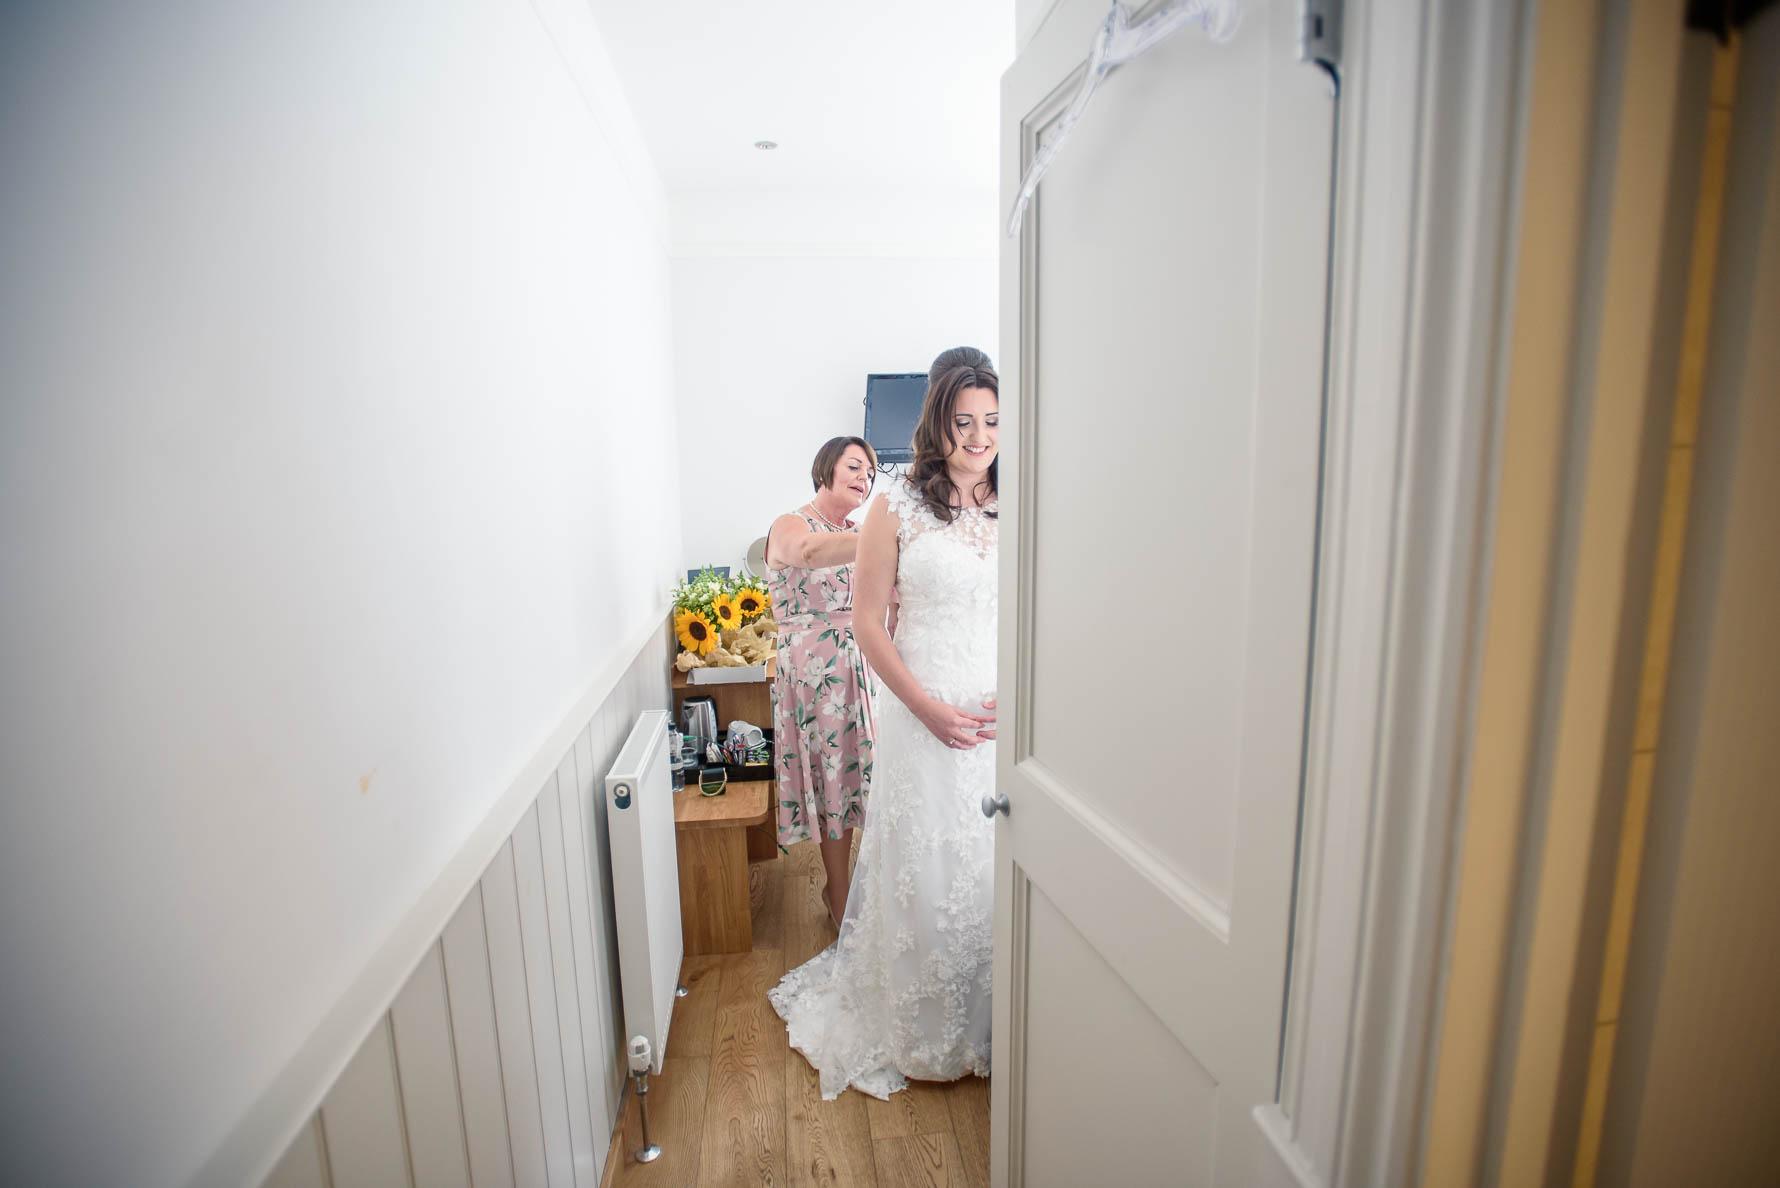 Wedding Photography at East Quay Venue-13.jpg